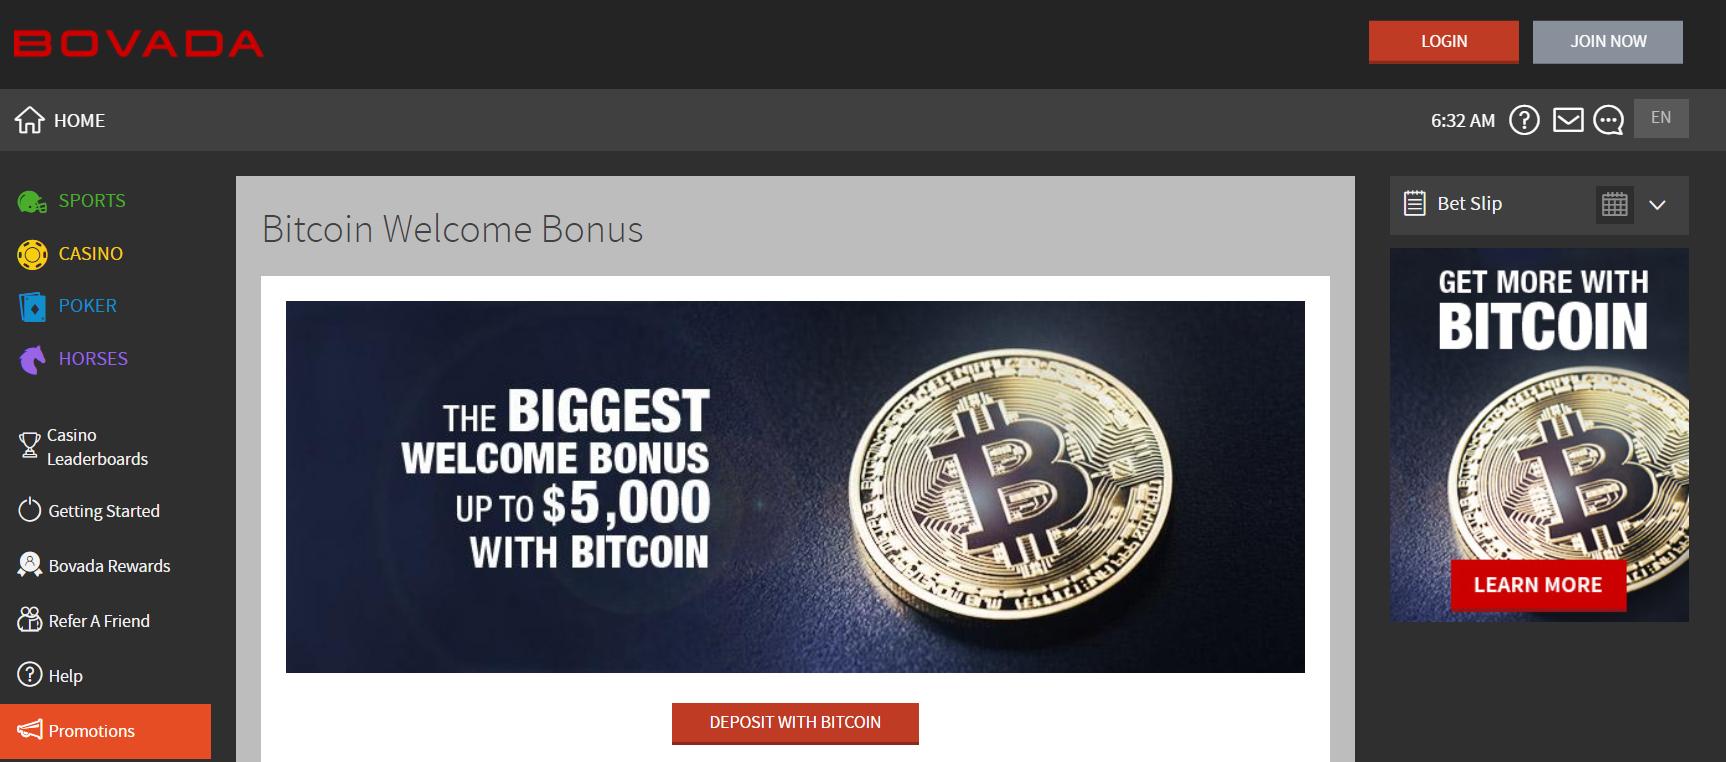 Bovada Bitcoin Payout